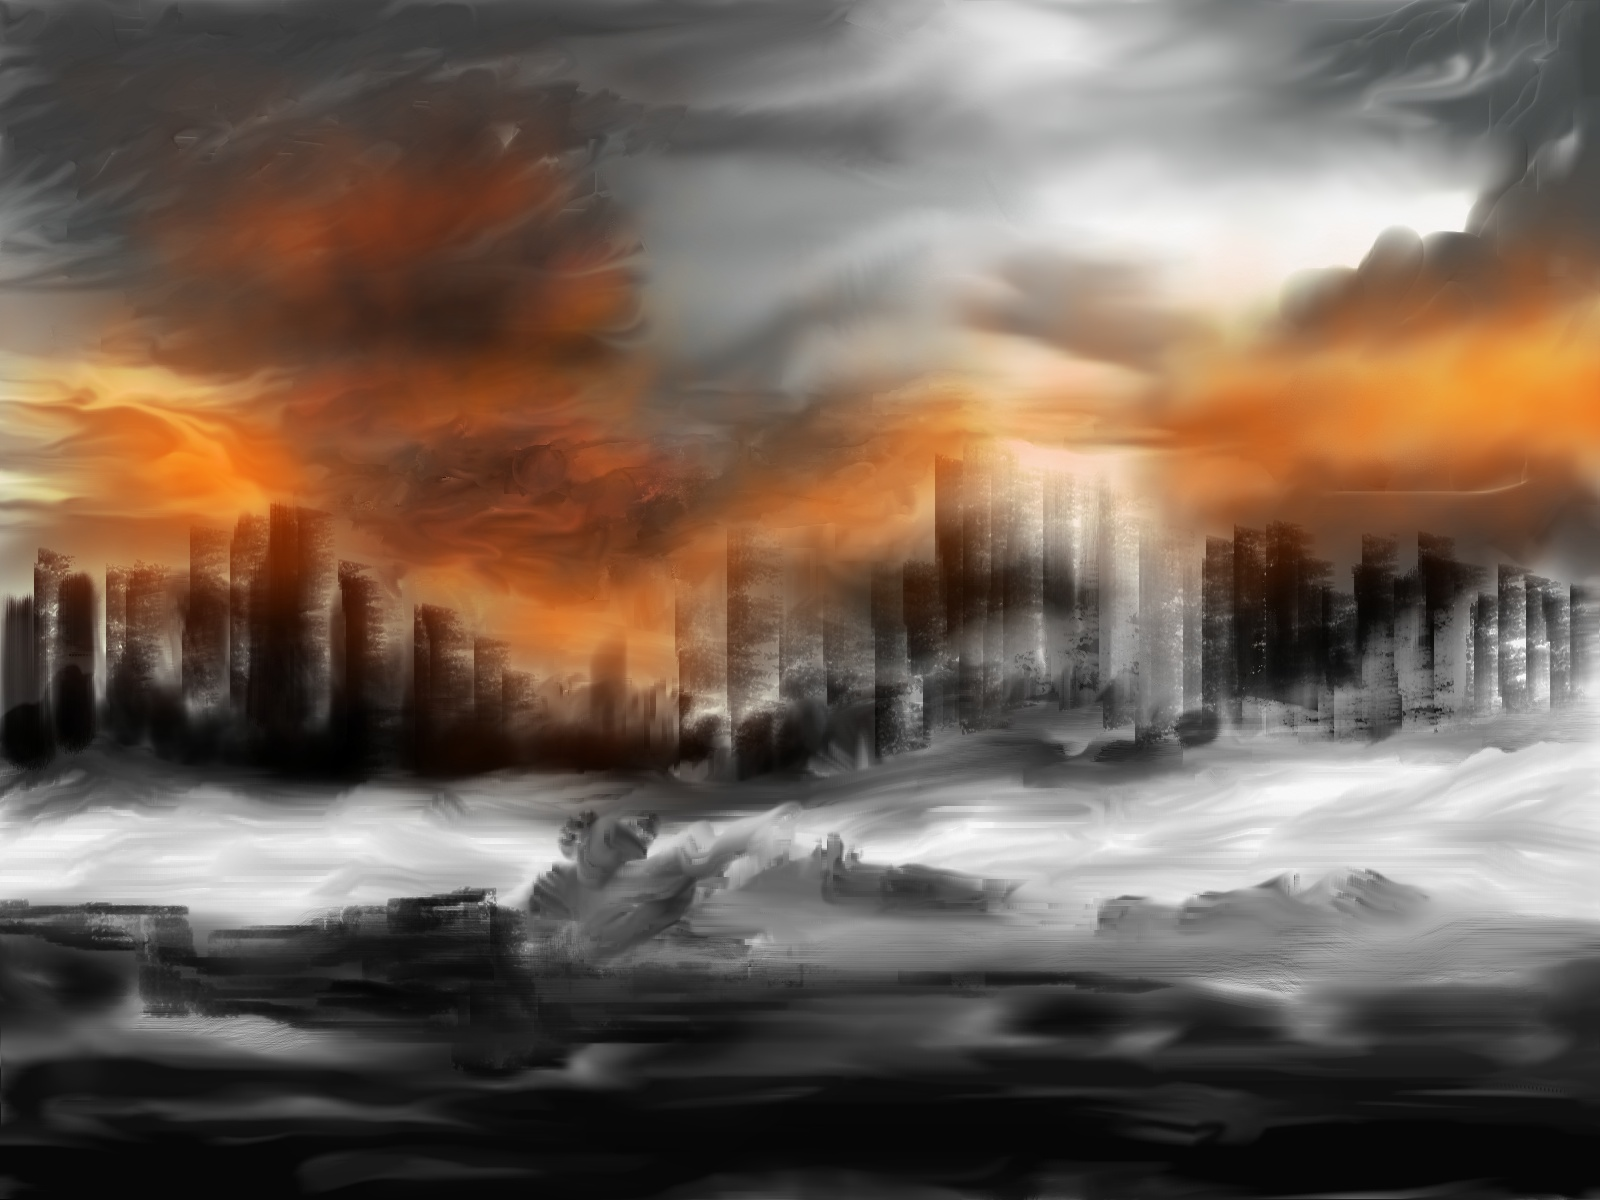 Armageddon Computer Wallpapers, Desktop Backgrounds ...